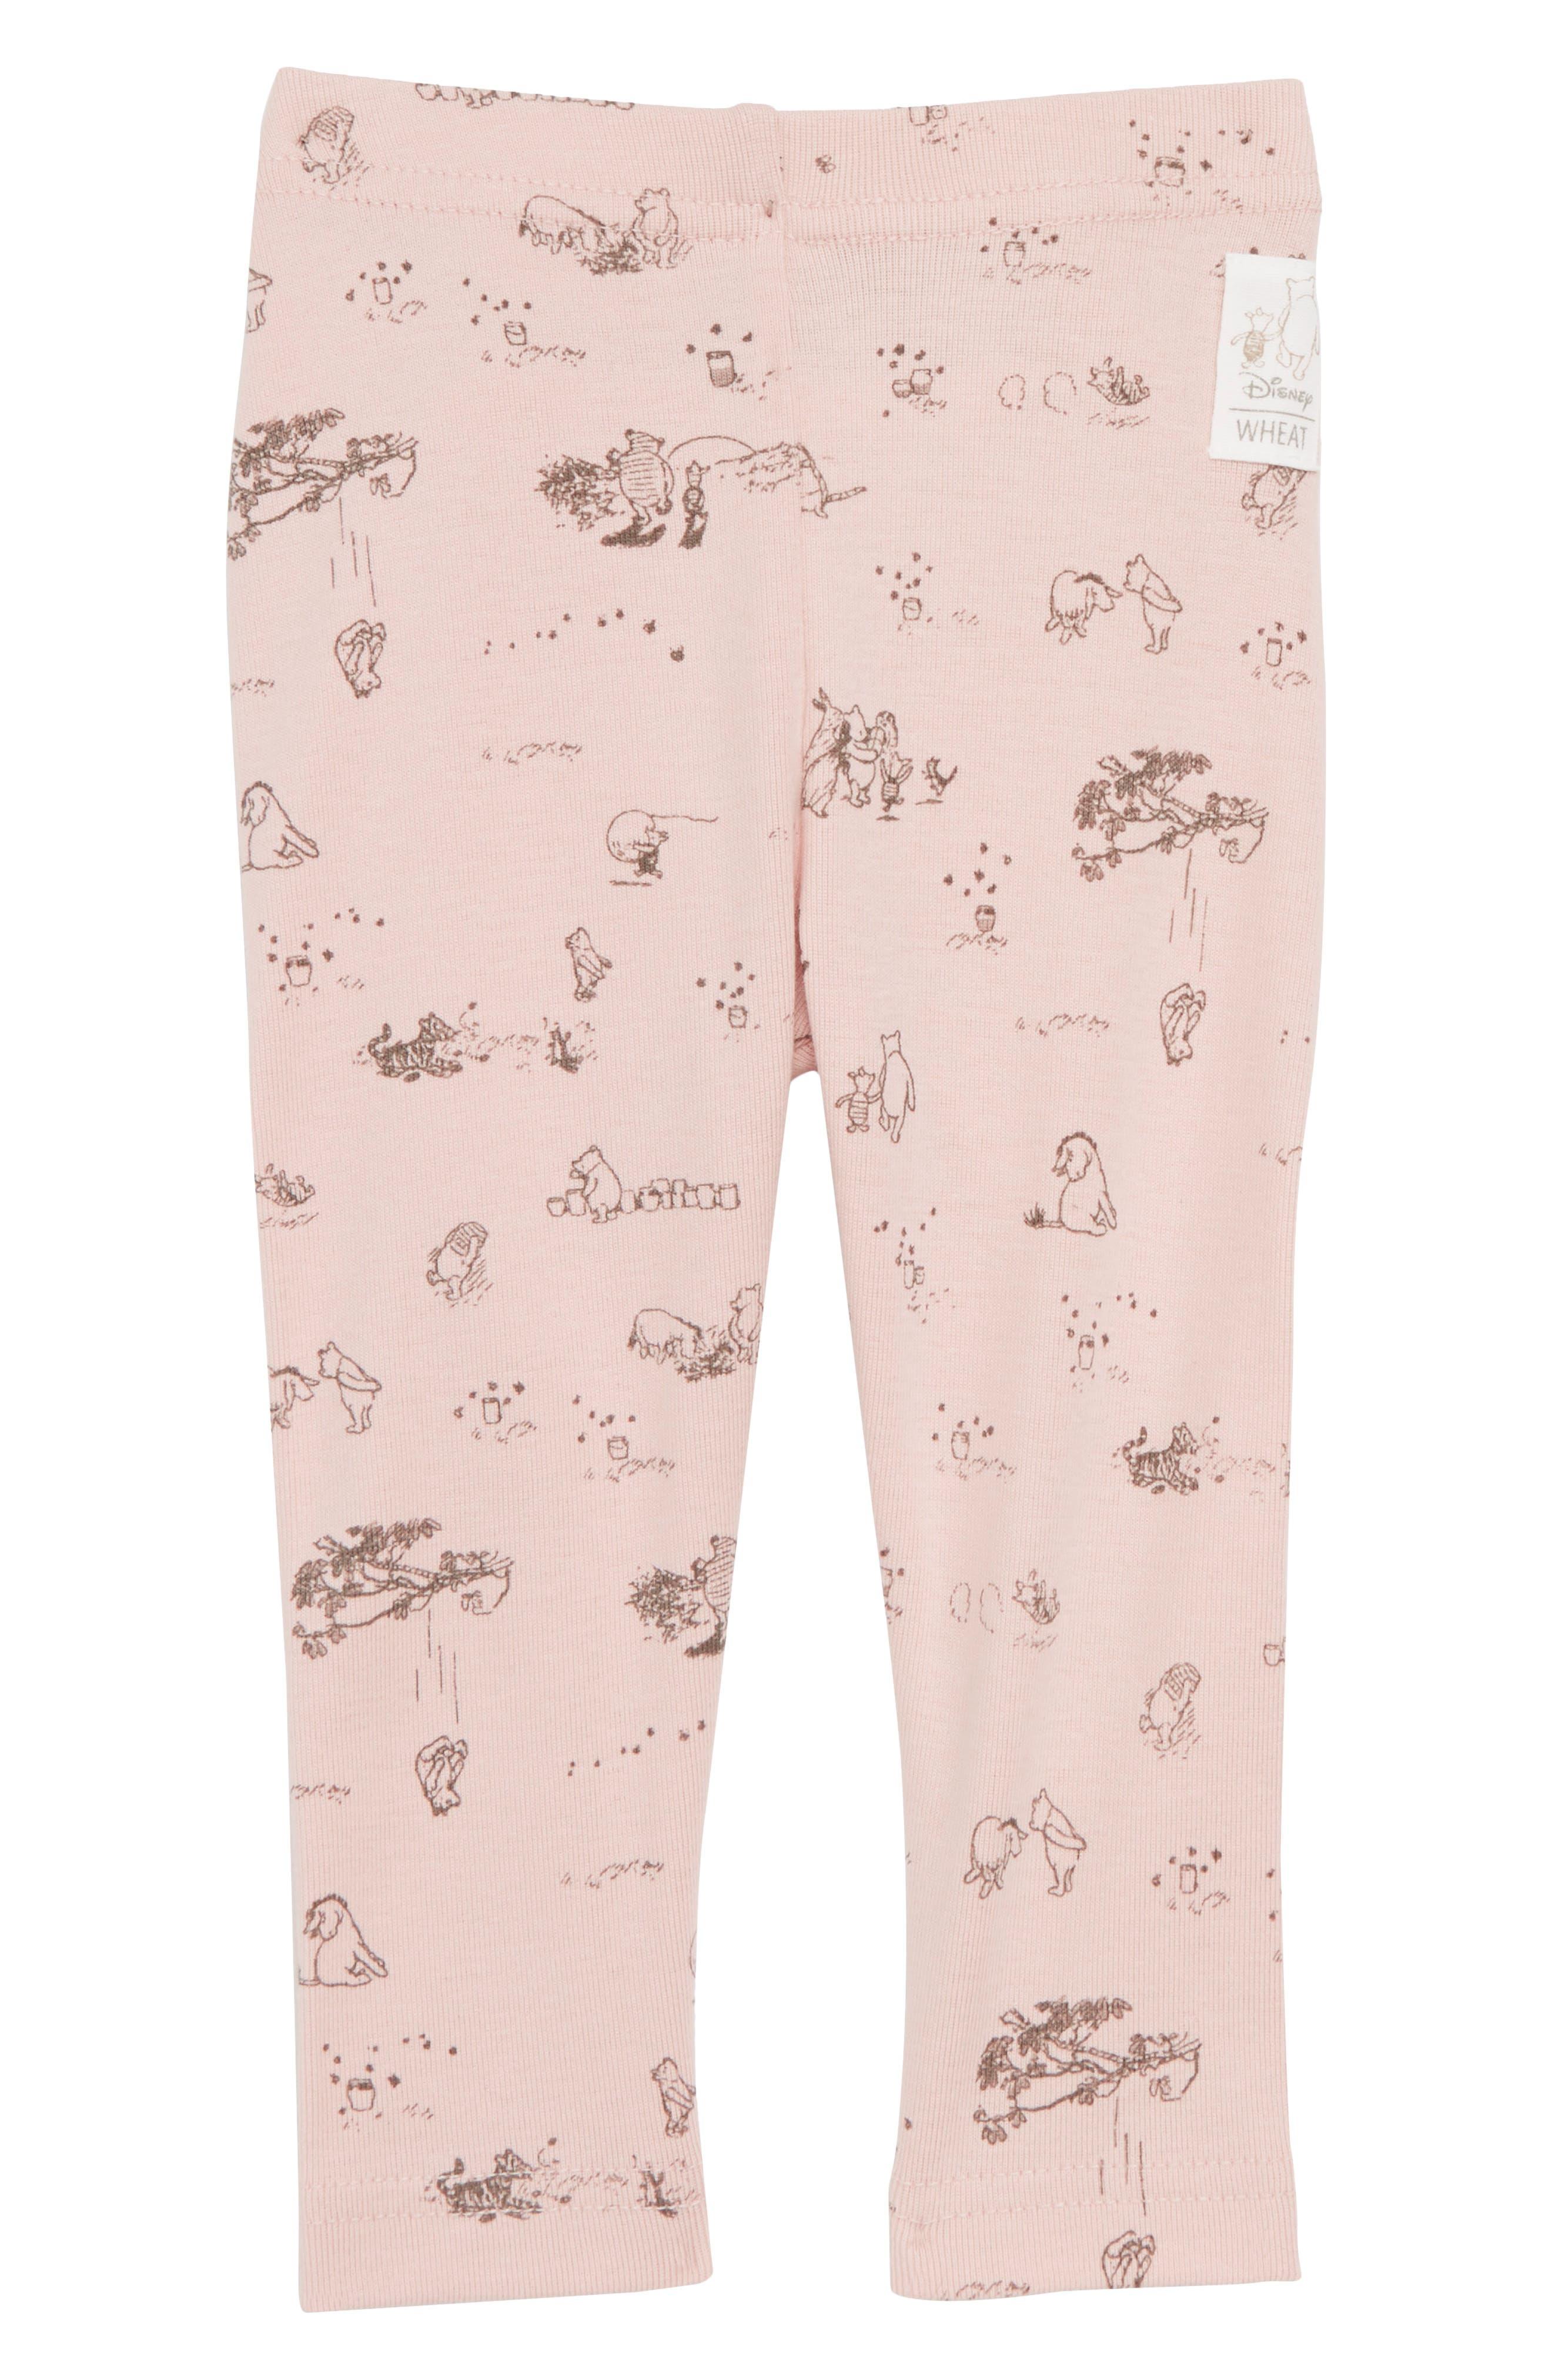 x Disney<sup>®</sup> Winnie the Pooh Organic Cotton Leggings,                         Main,                         color, Powder